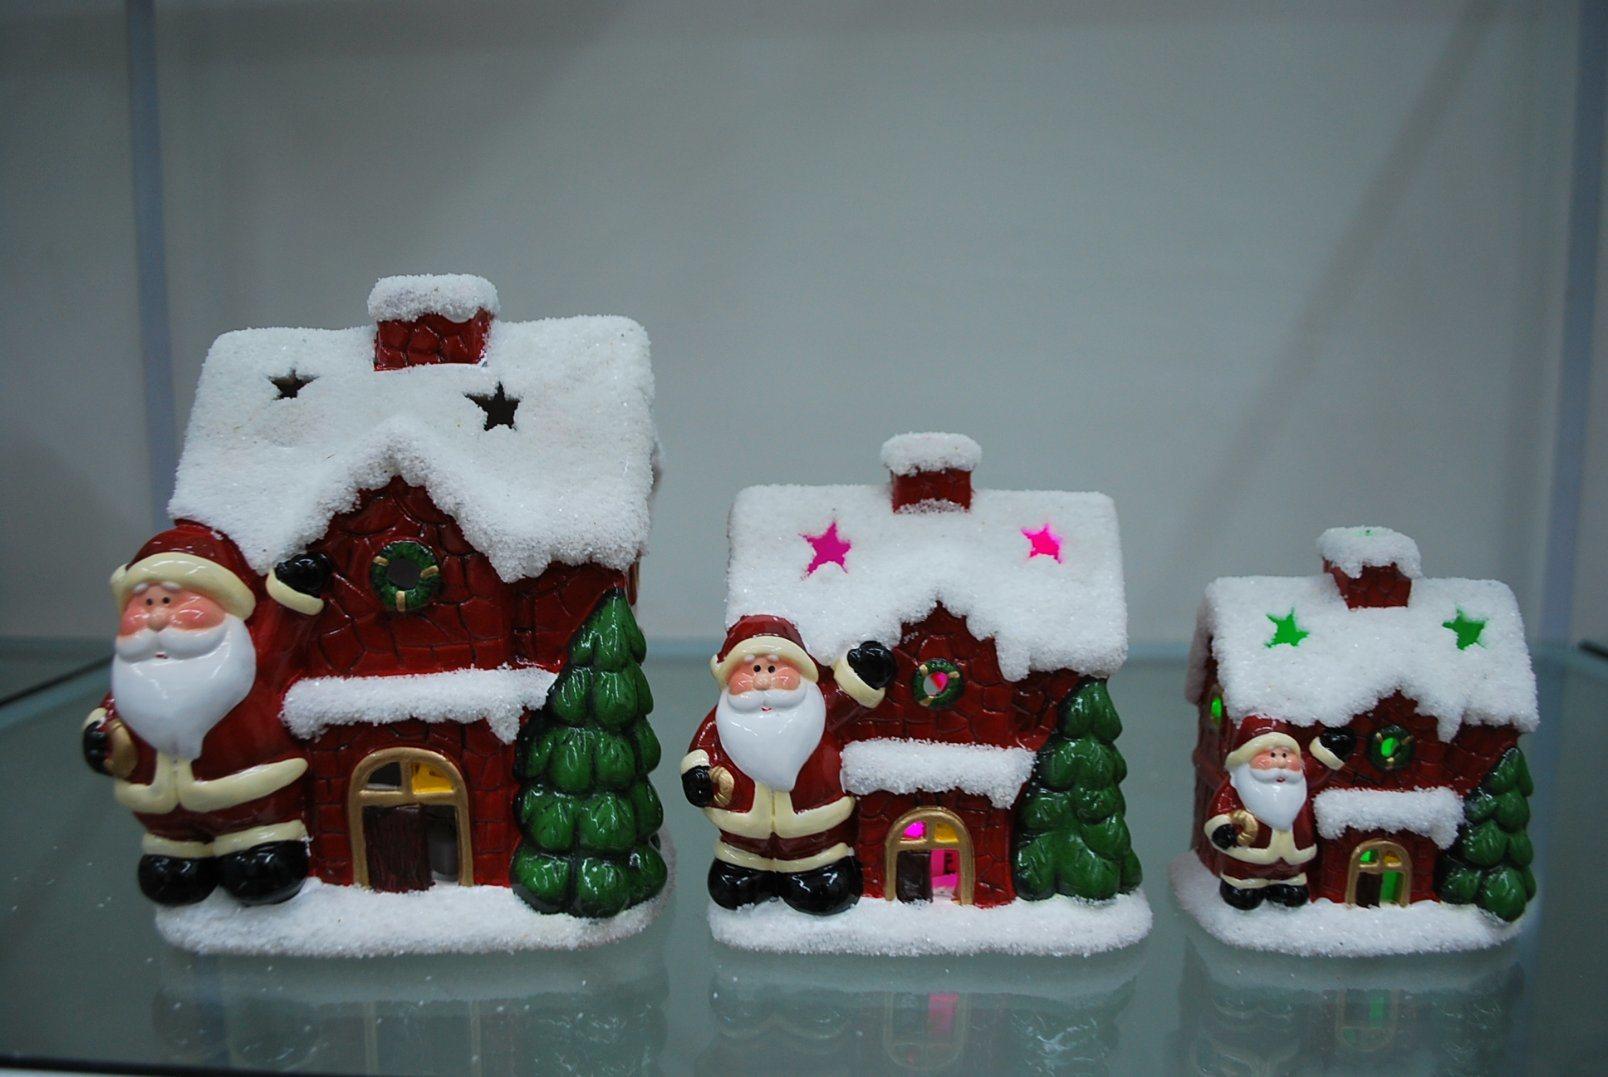 Xmas Candle Holder Home Decor Craft